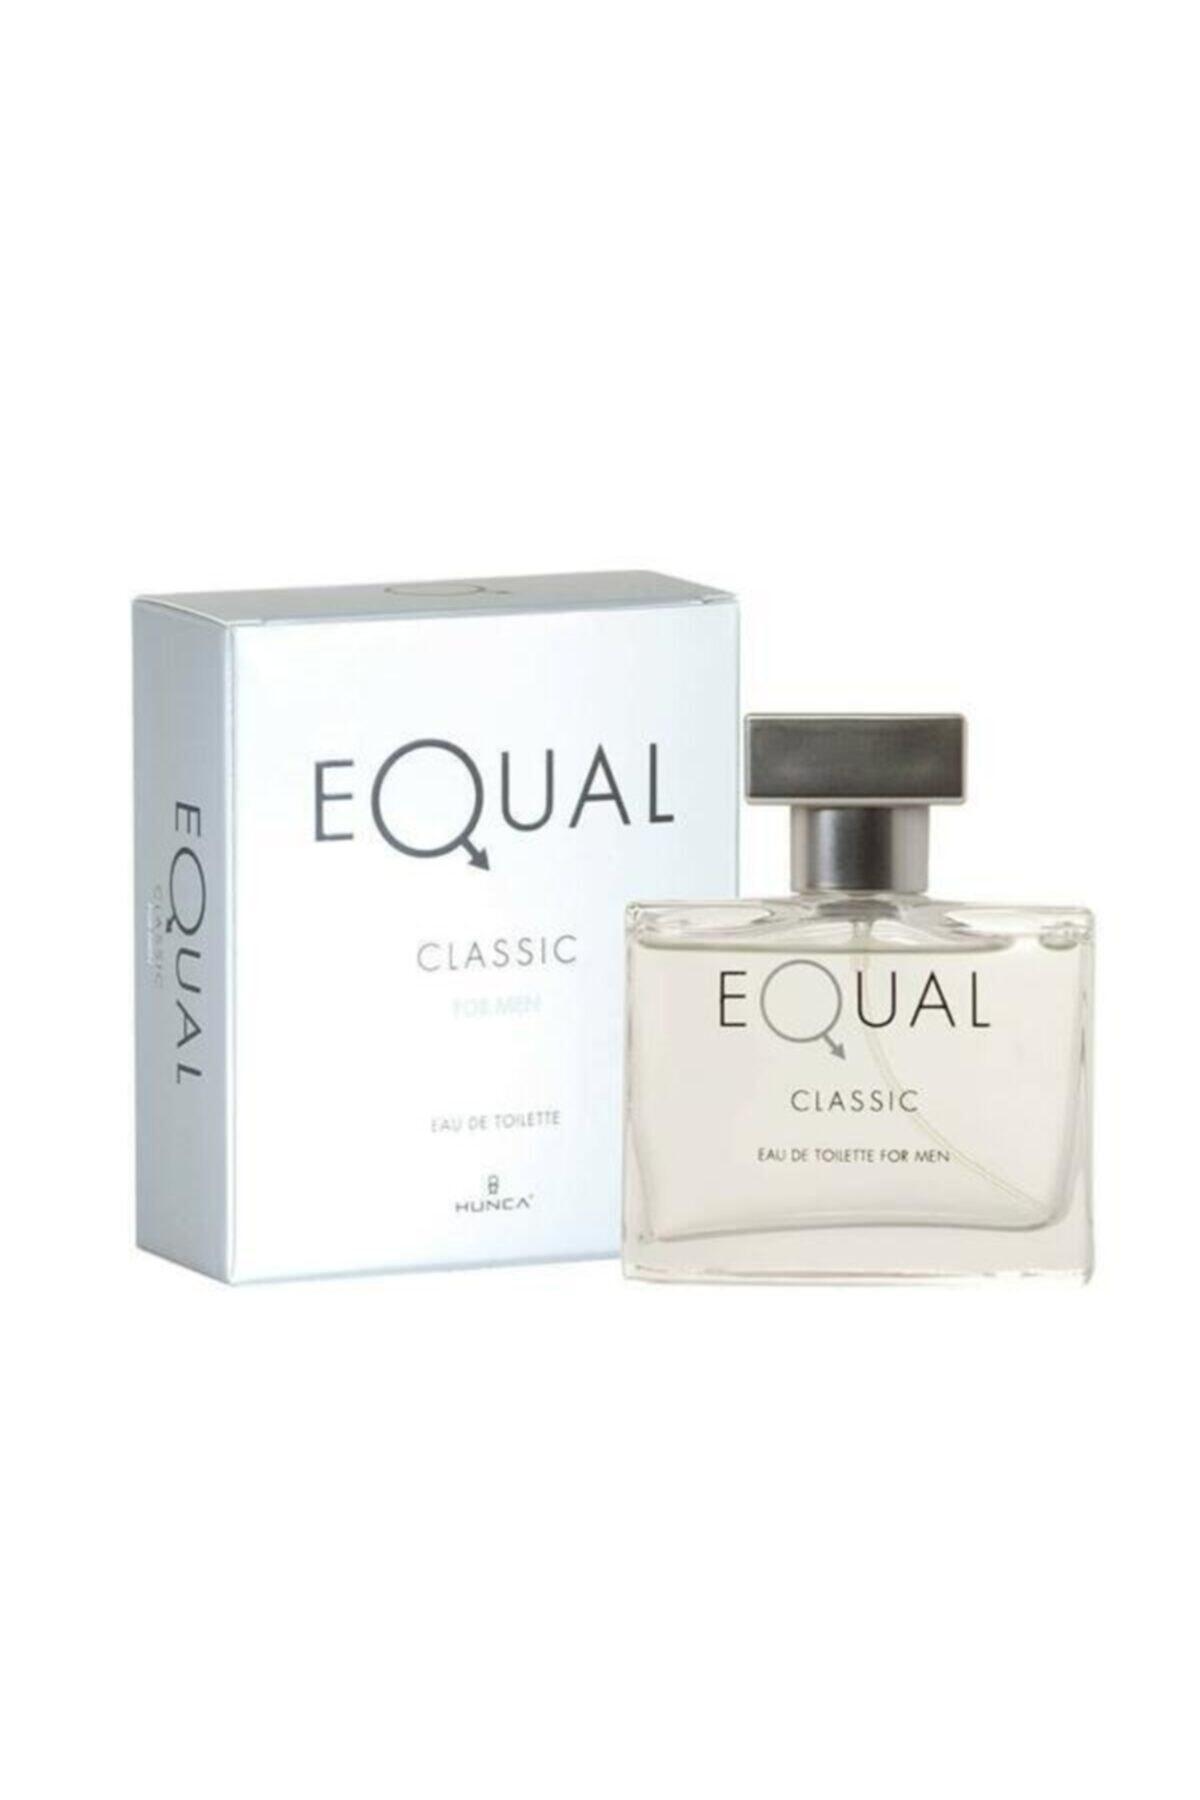 Equal Classic Erkek Edt 75 ml Parfüm 8690973020246 1